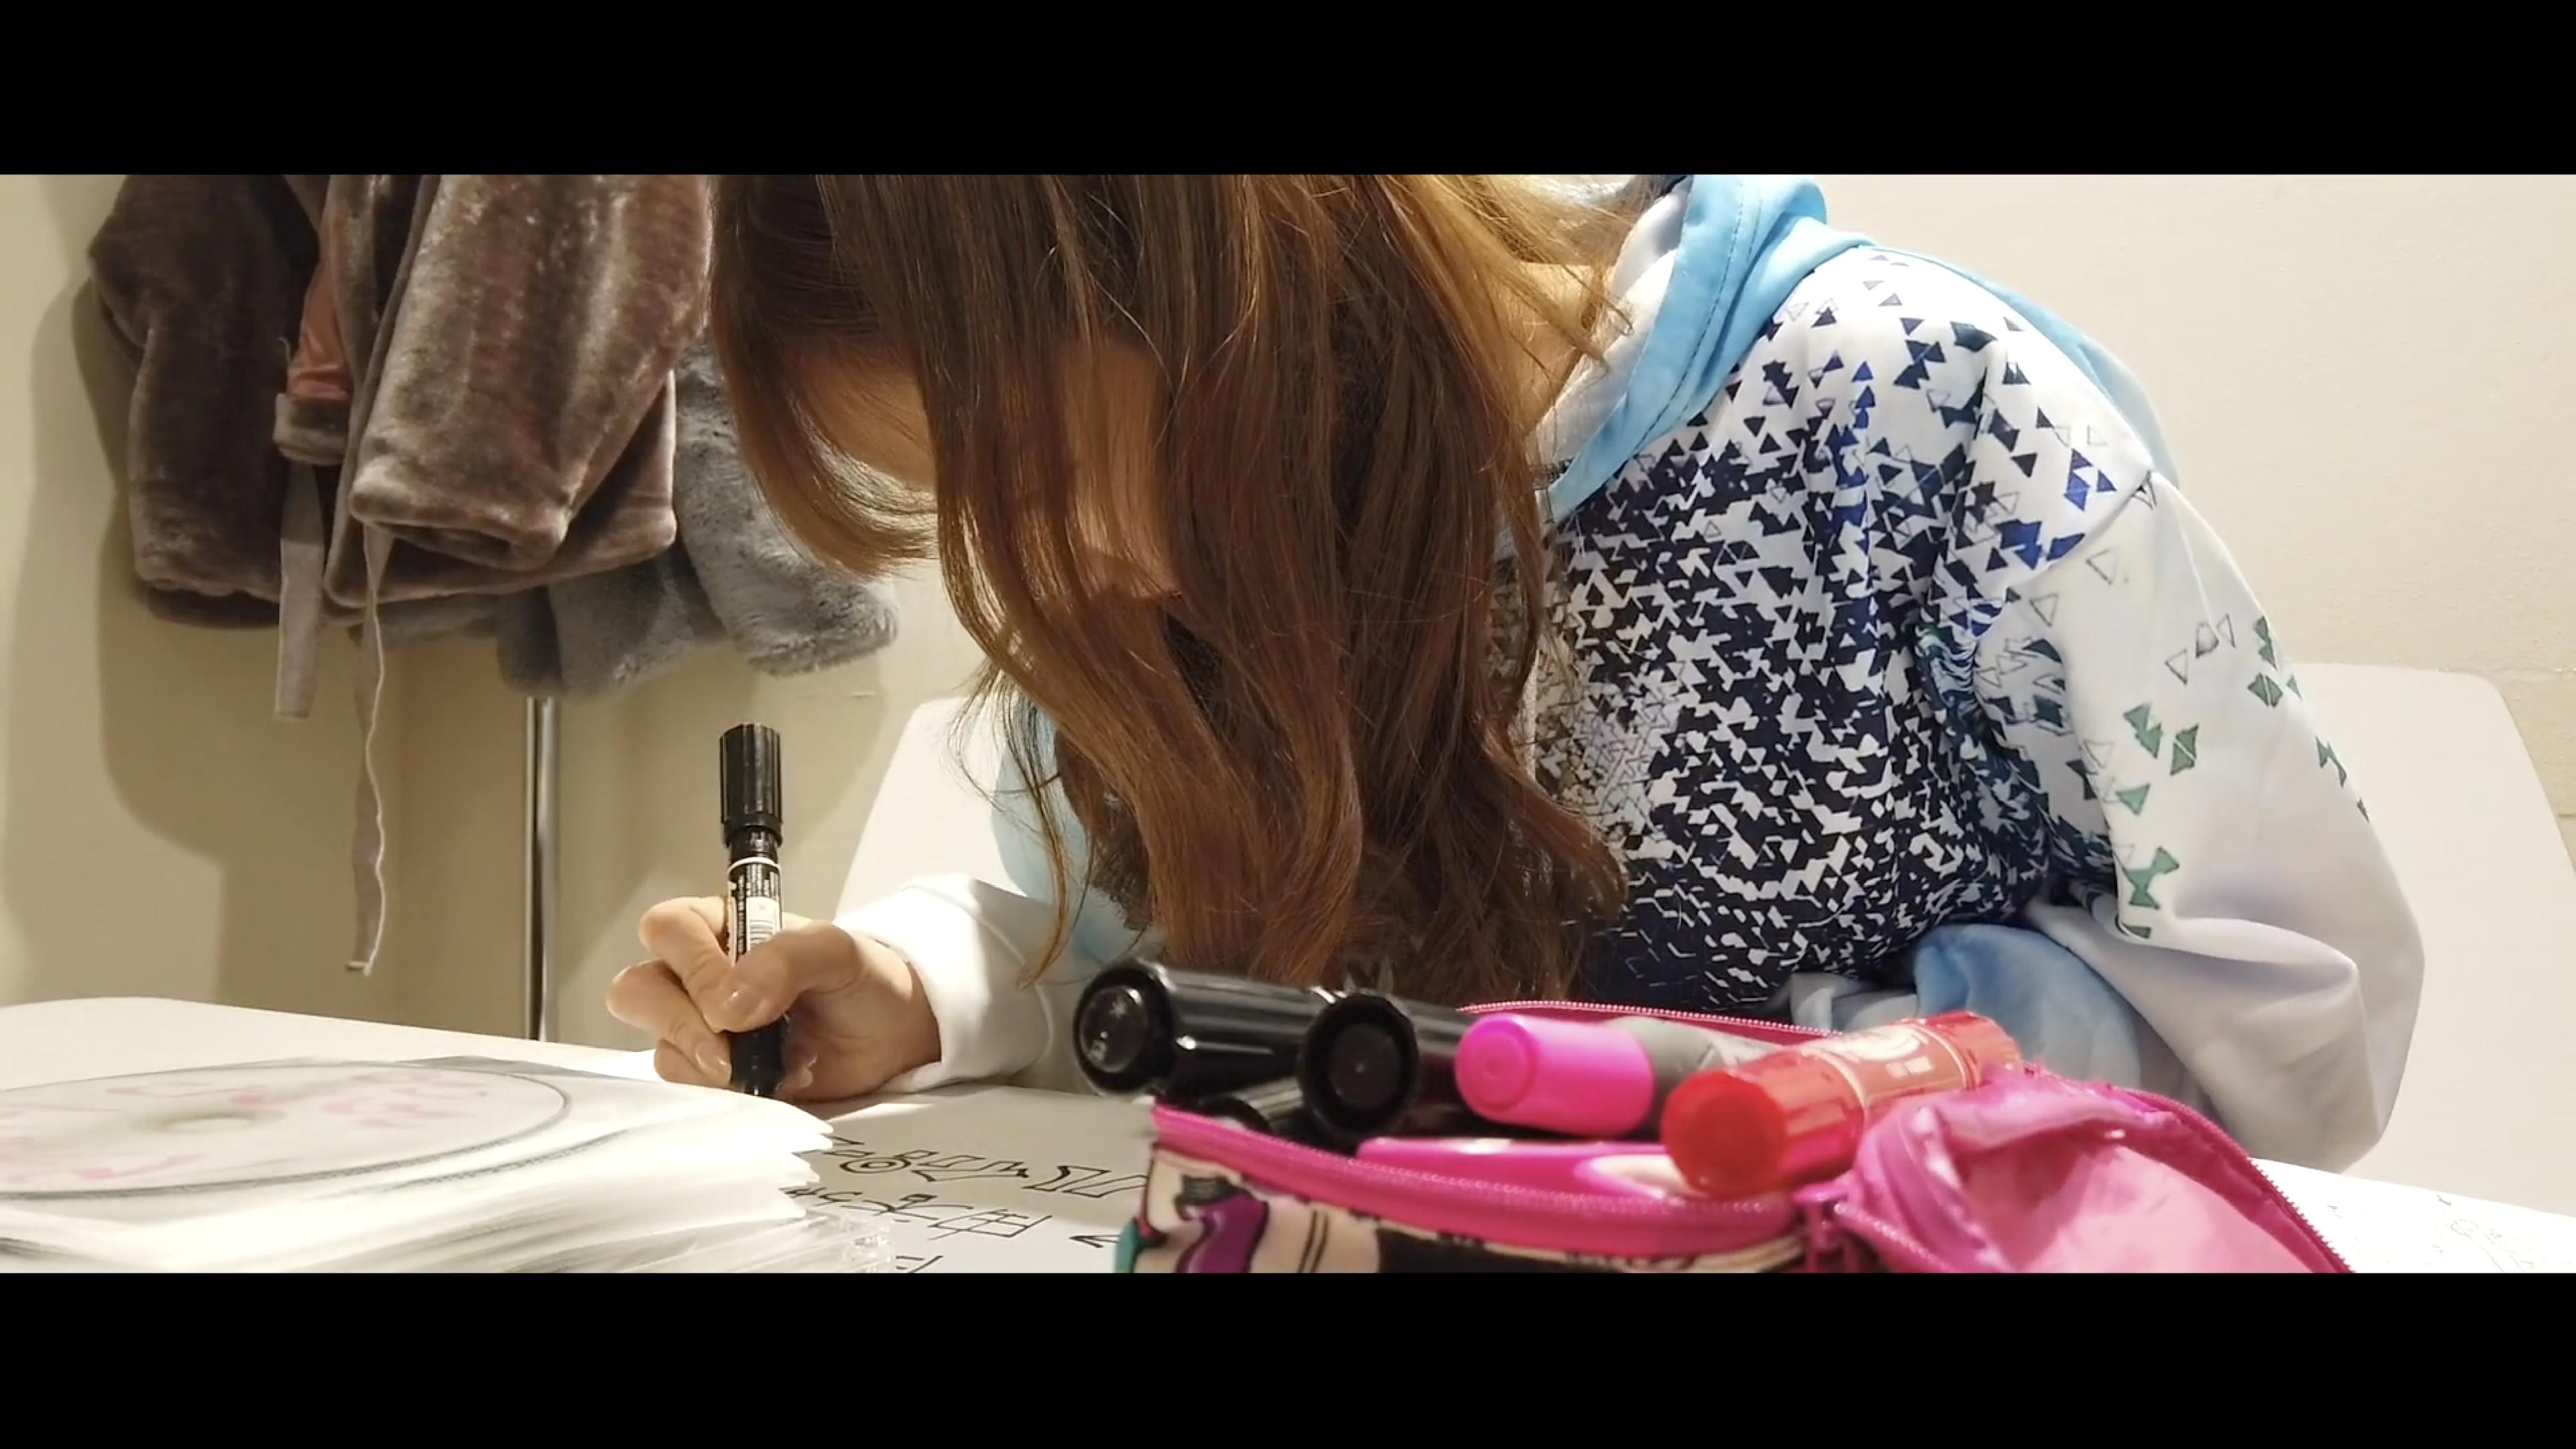 hy4_4yh(ハイパーヨーヨ)ドキュメンタリー第5話 画像01